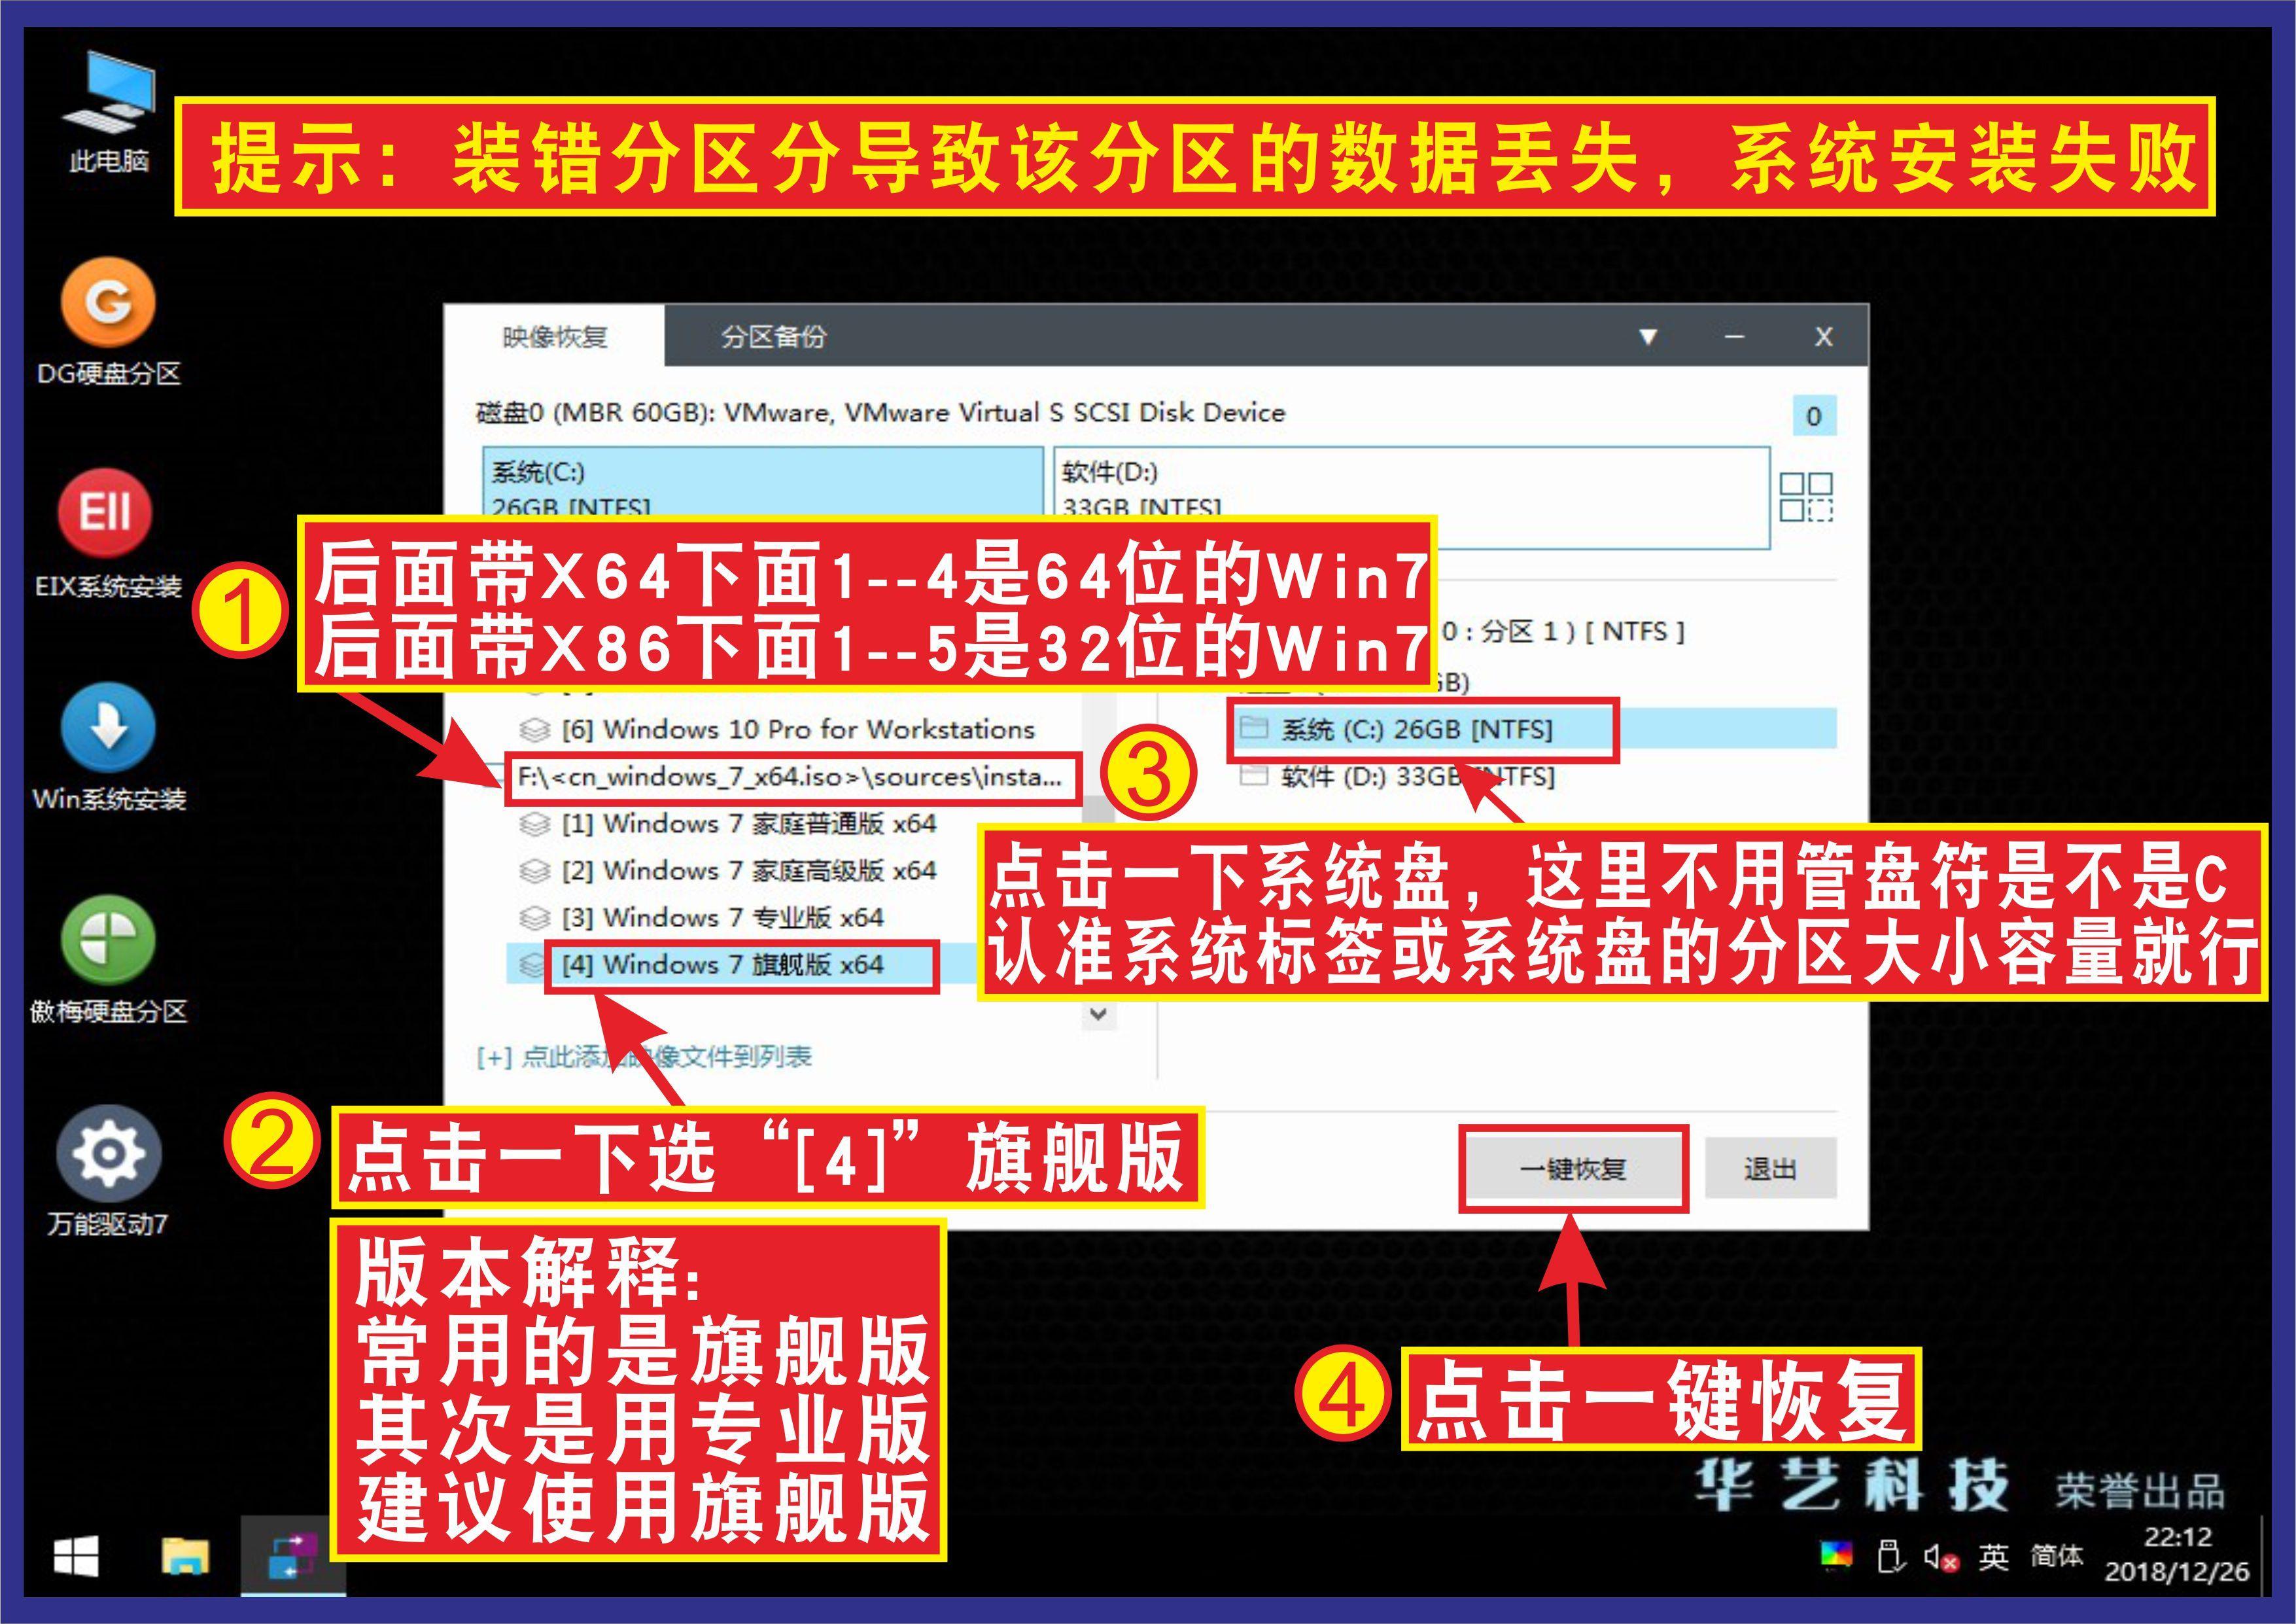 Windows7原版系统喝水教程安装小步骤图片